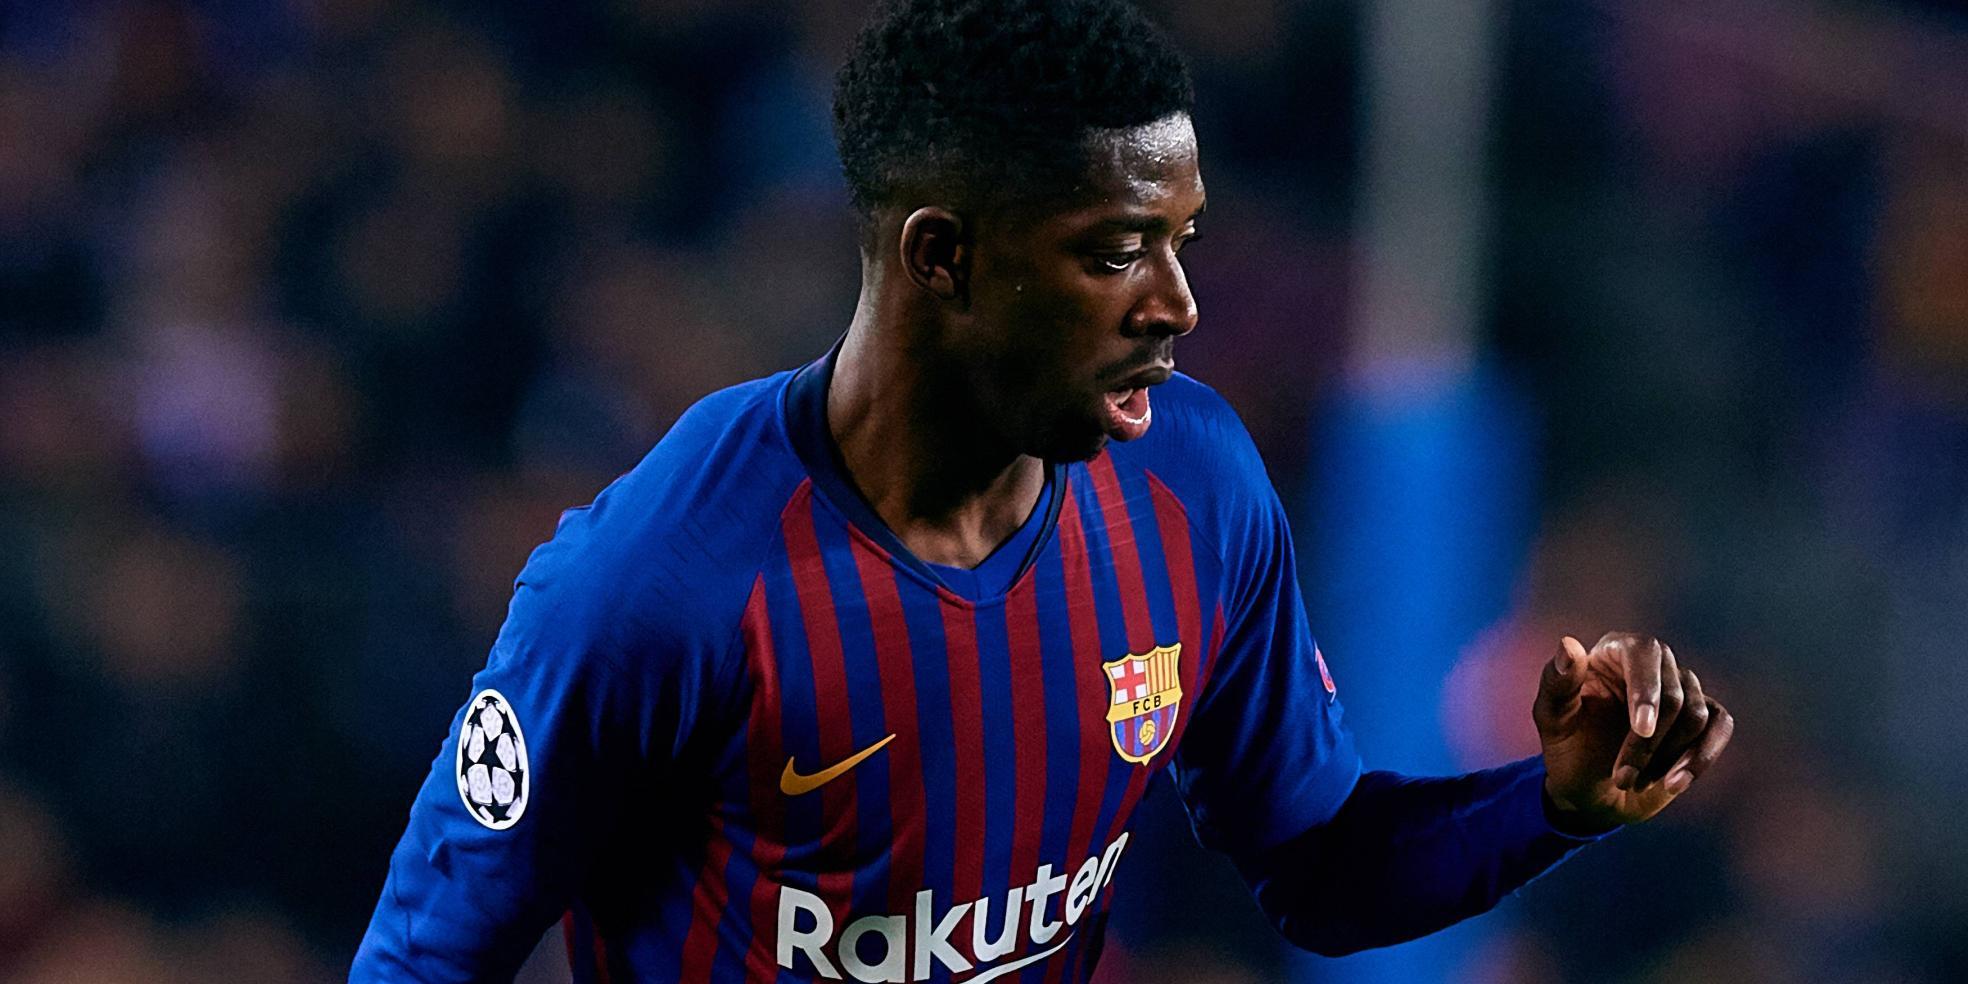 Ousmane Dembele vom FC Barcelona